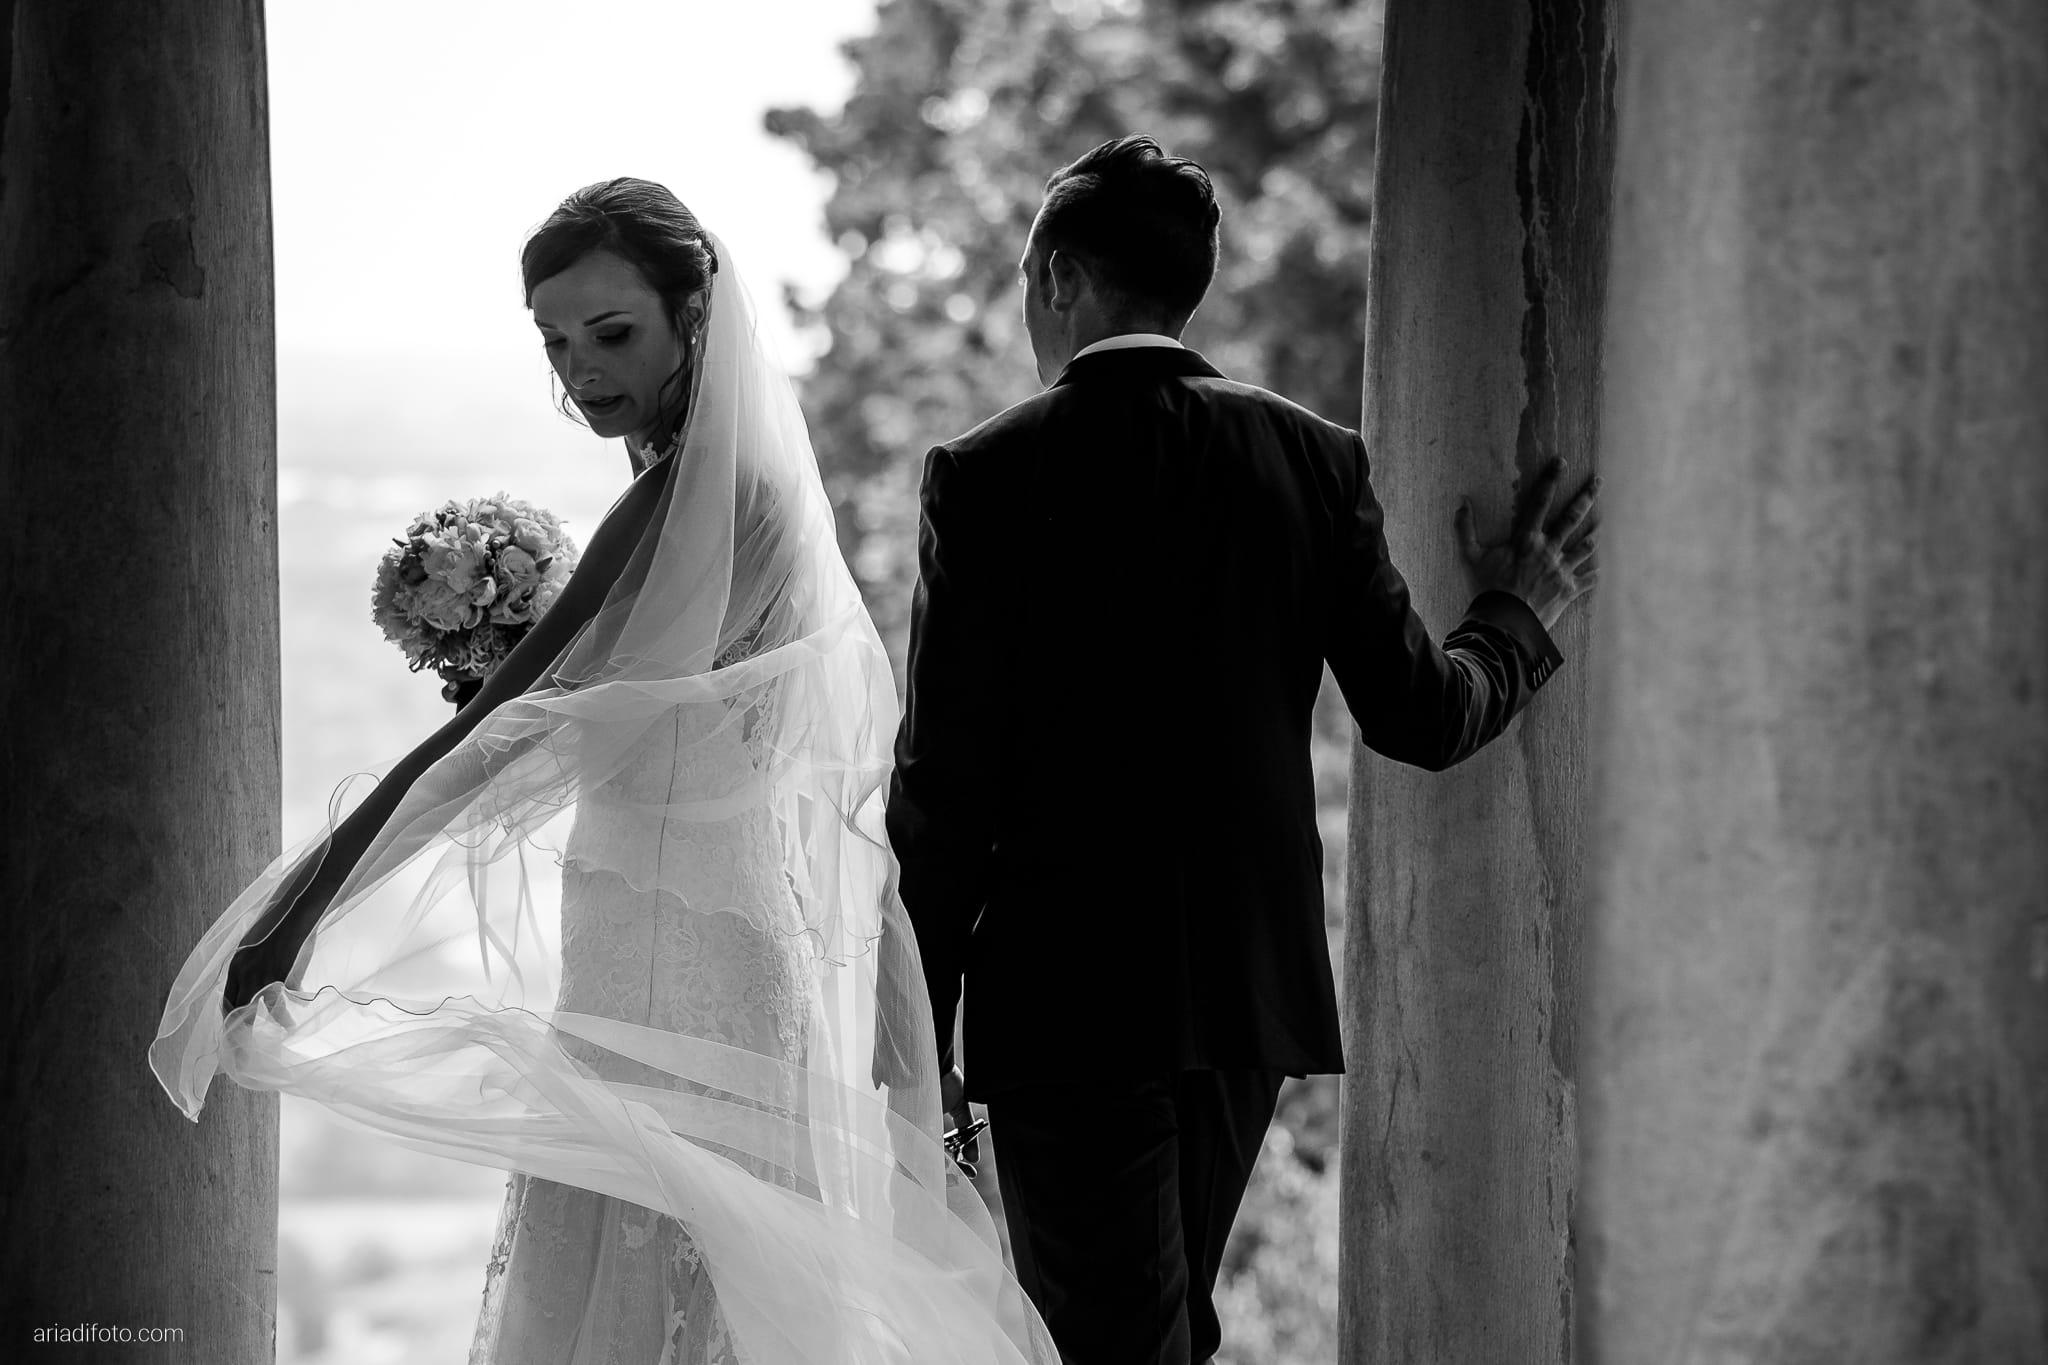 Valentina Marco Matrimonio Duomo Gorizia Castelvecchio Sagrado ritratti sposi gloriette